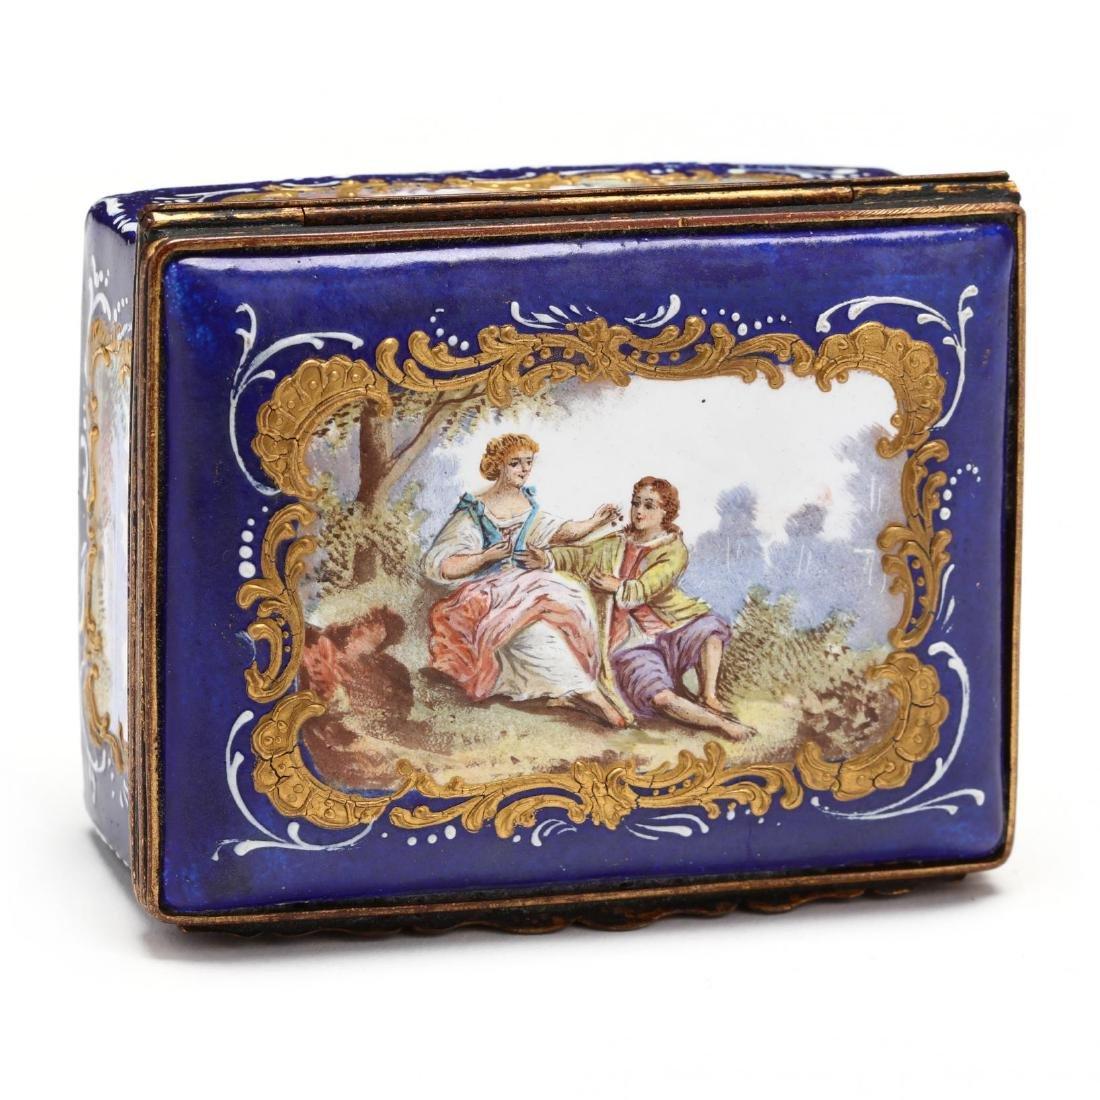 An Antique Enamel Table Box, att. Bilston - 5